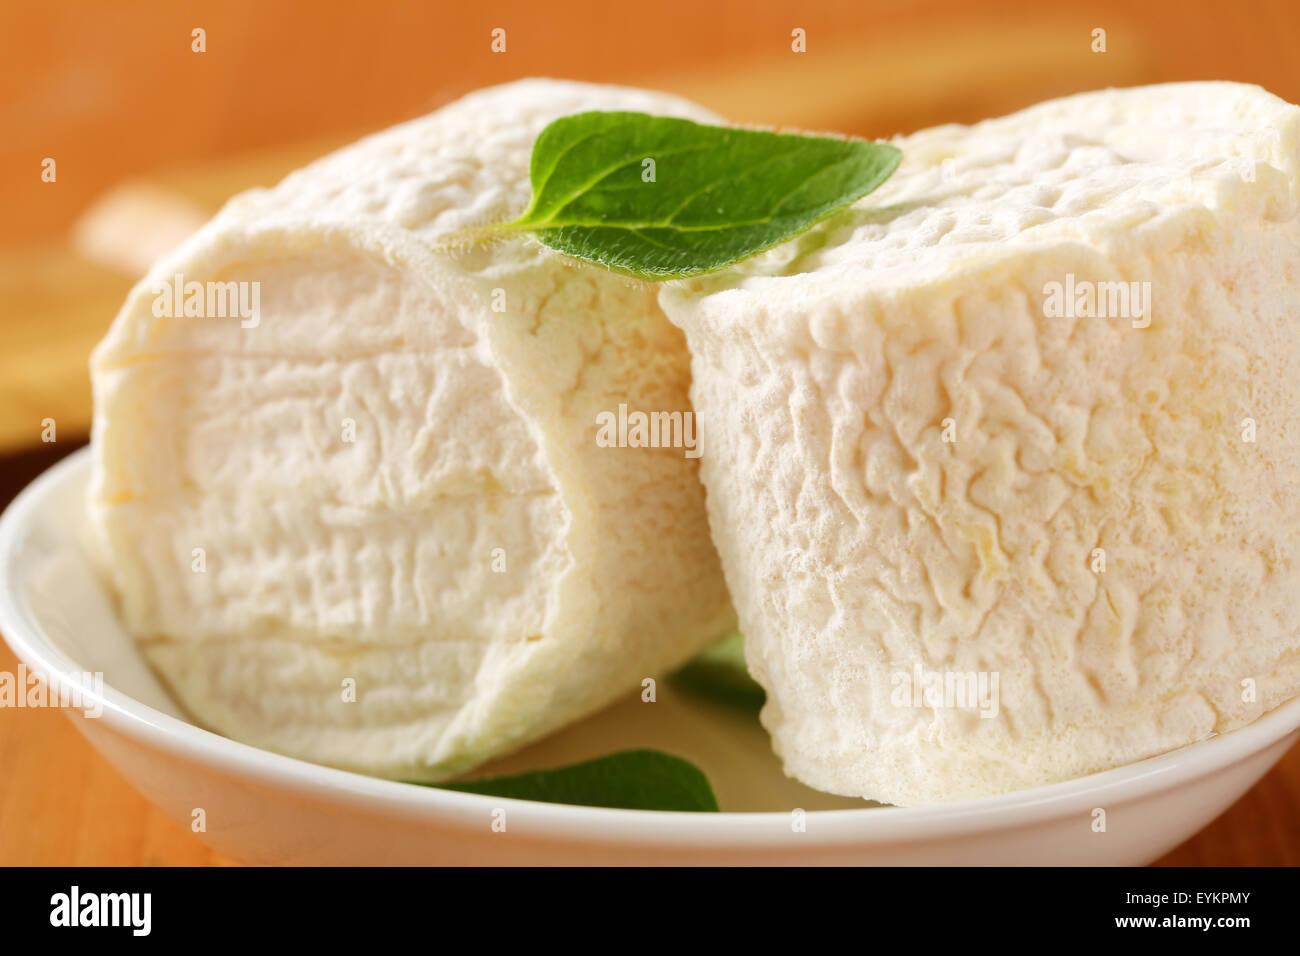 Crottins de Chevre - French goat's milk cheese - Stock Image